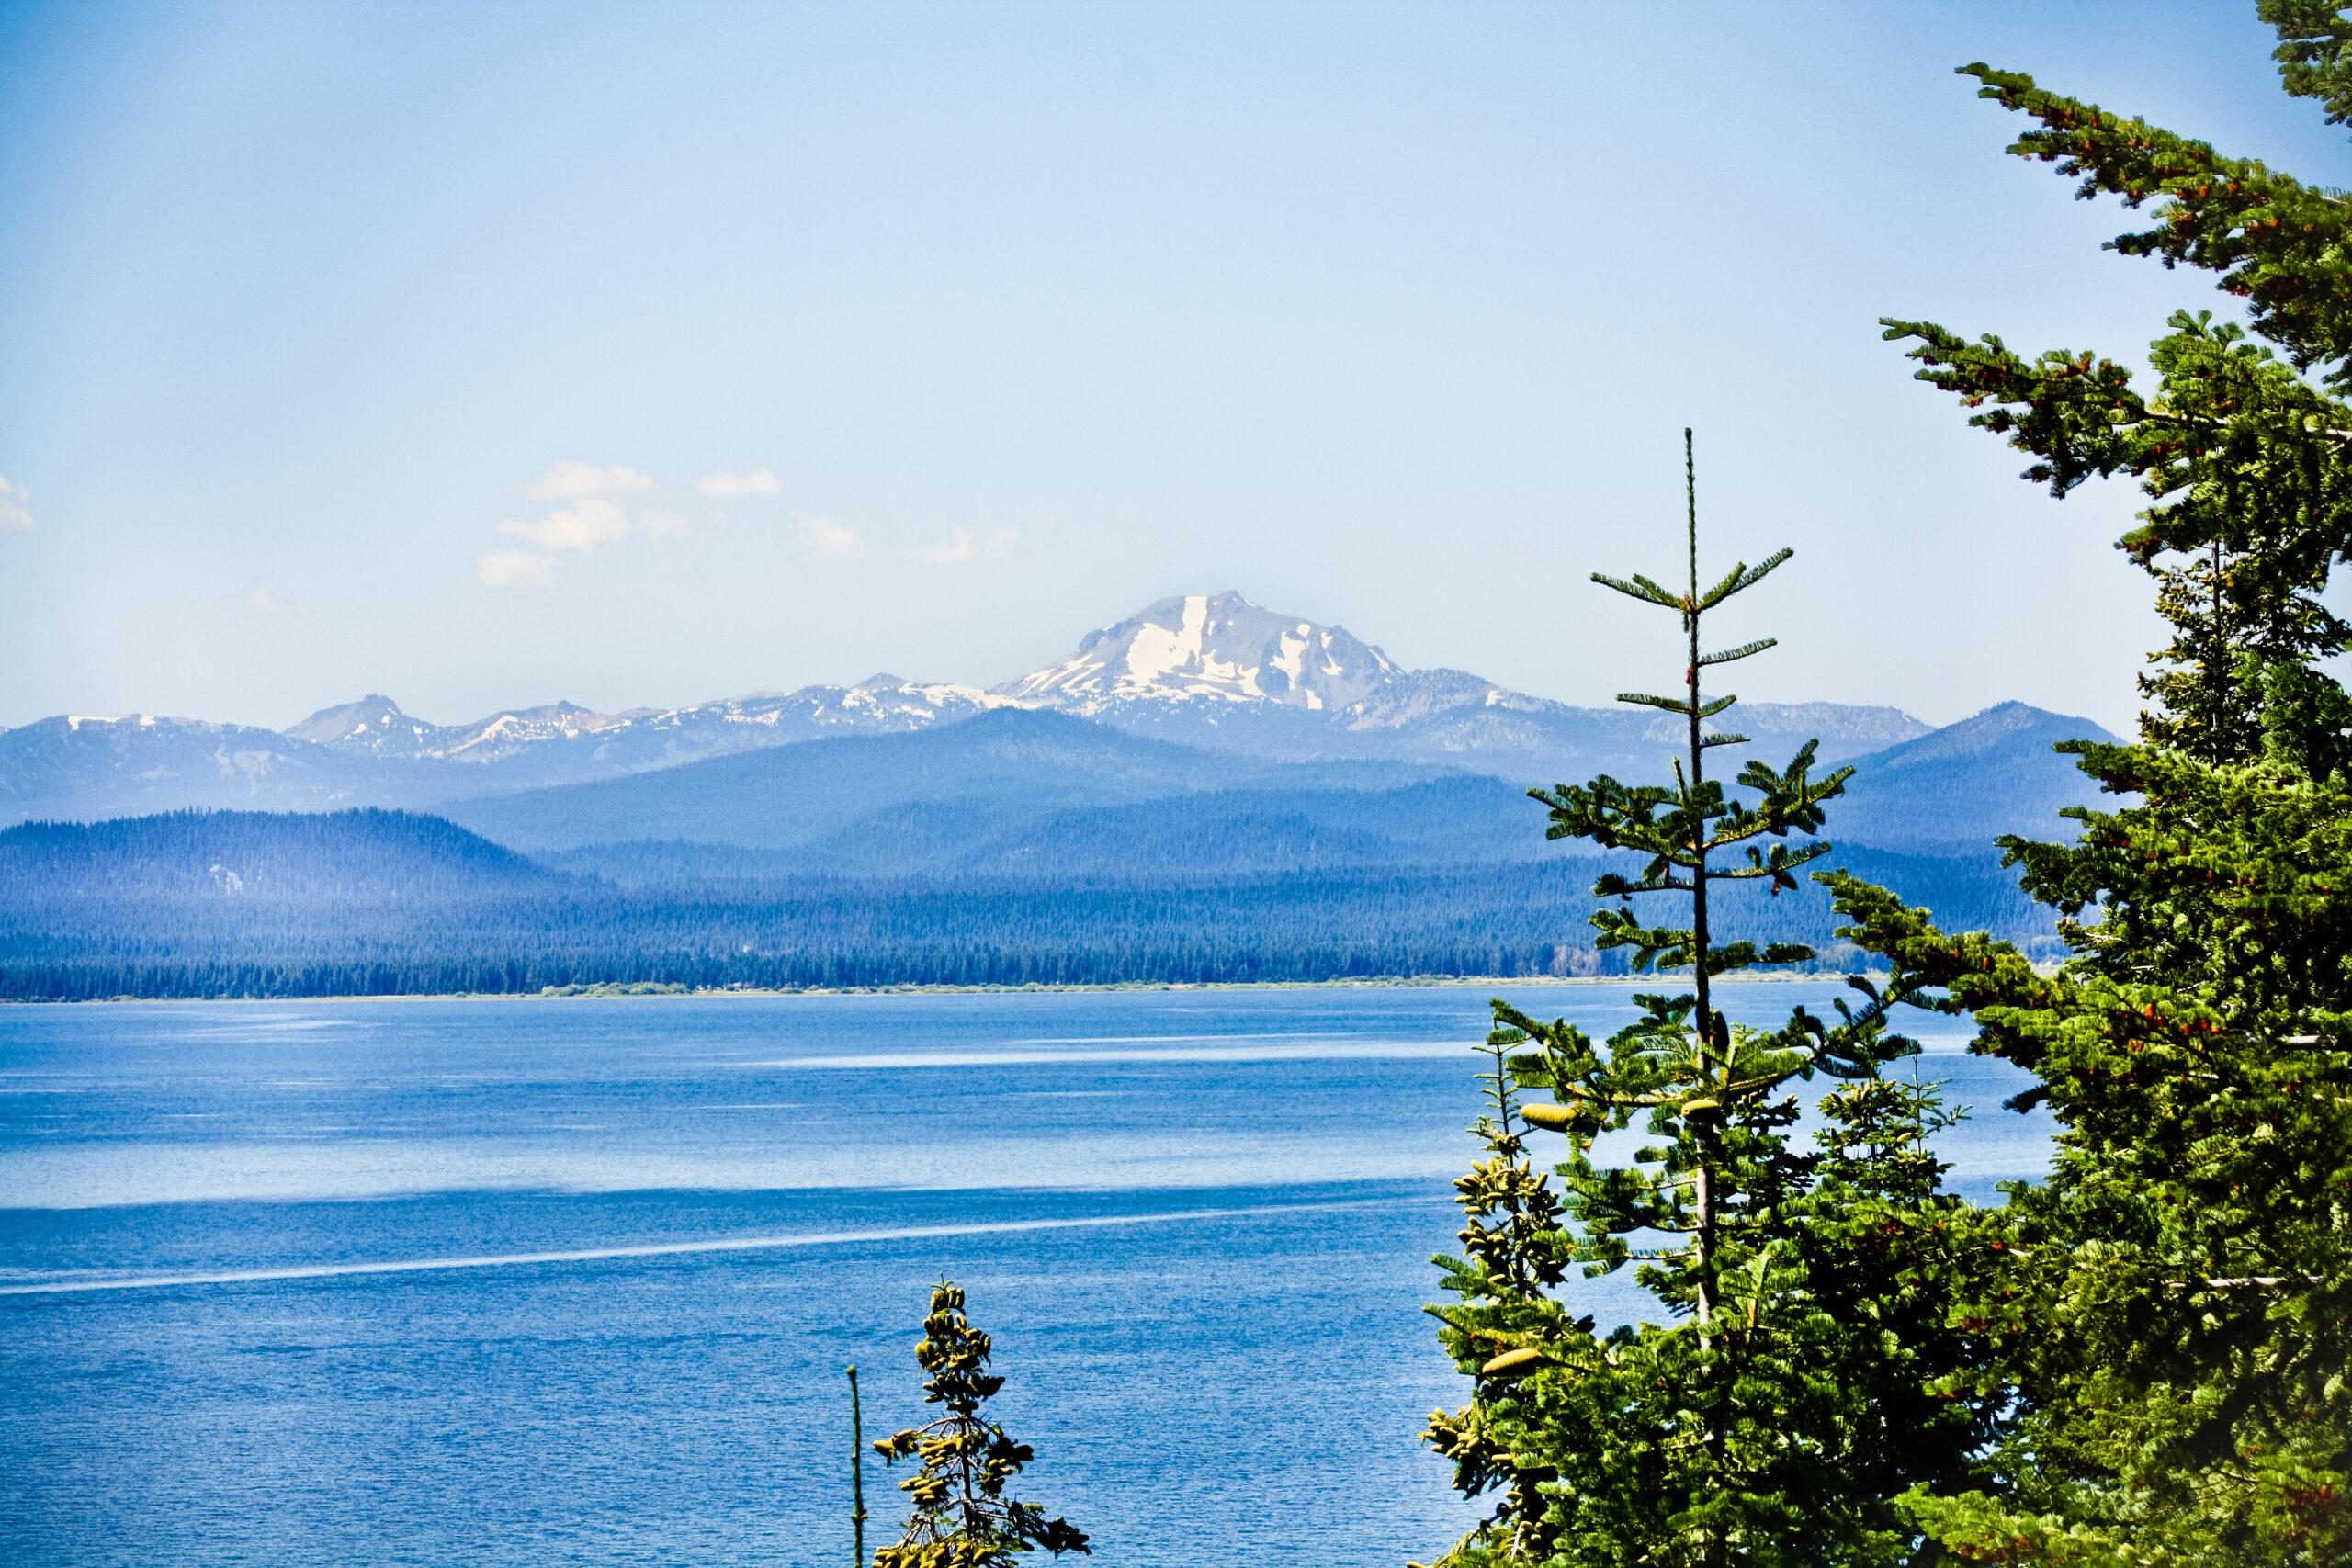 Almanor:A Jewel of a Lake